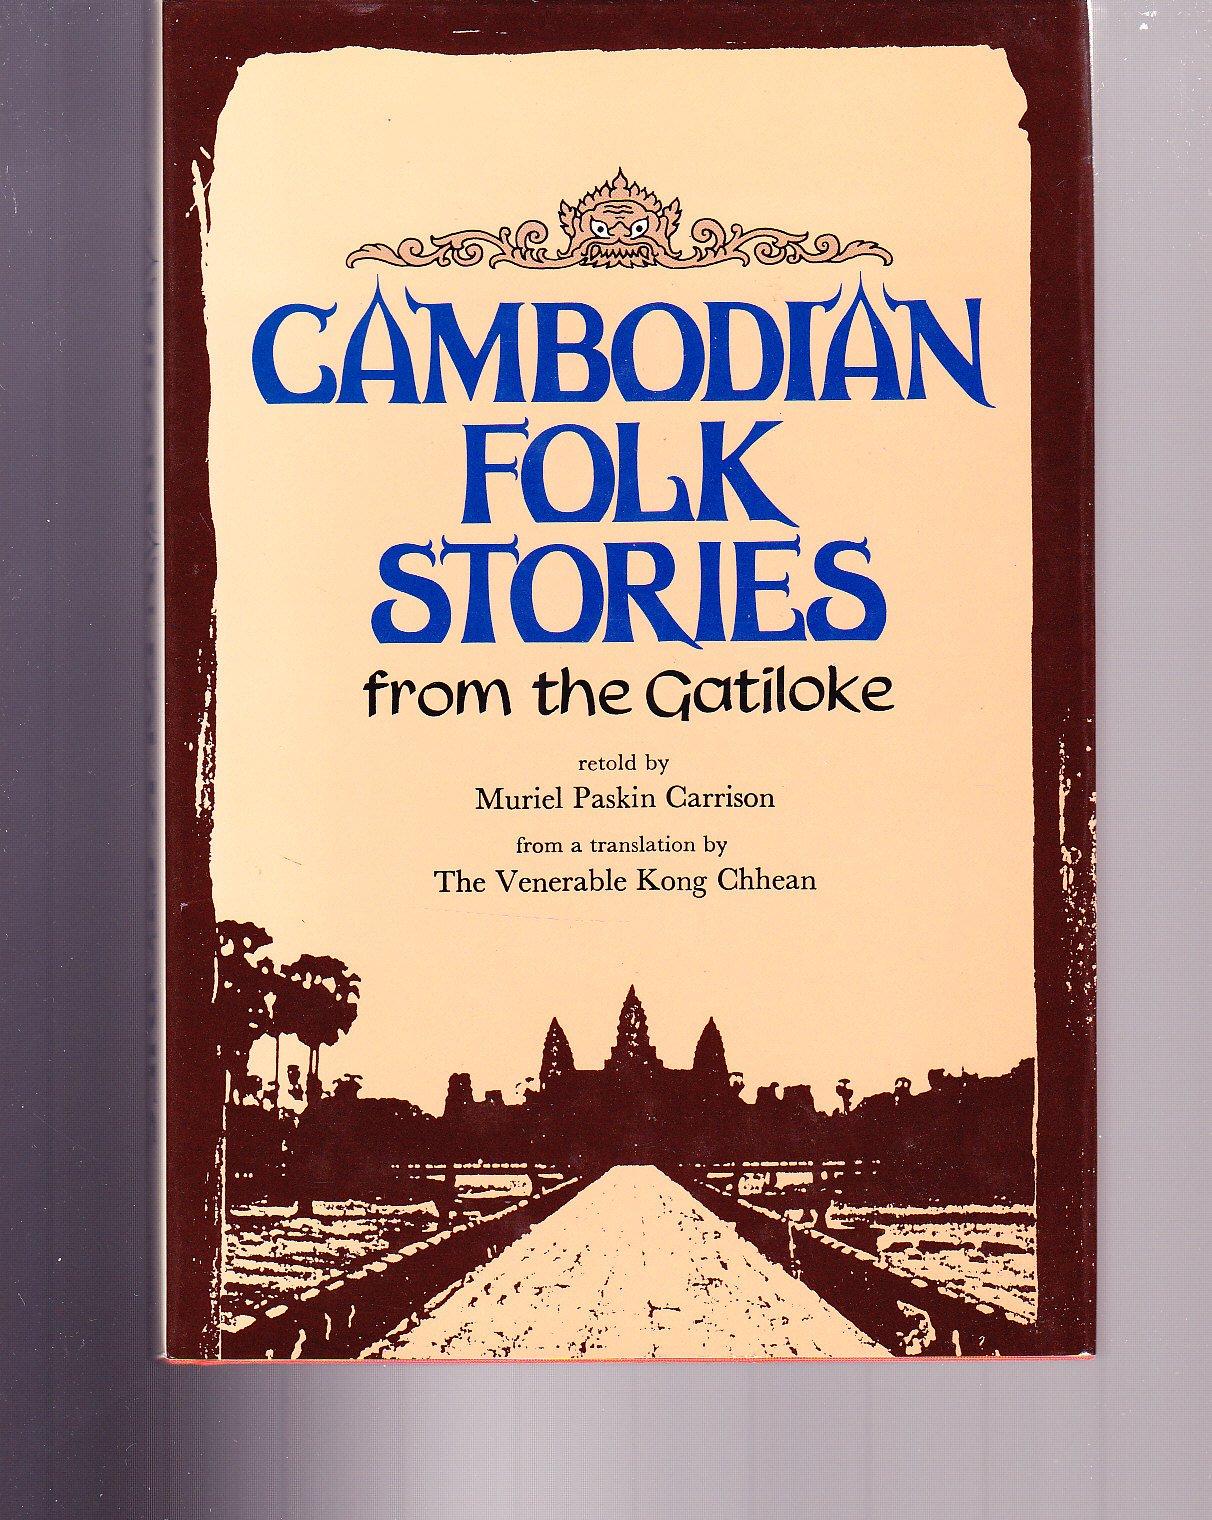 Amazon.com: Cambodian Folk Stories from the Gatiloke (9780804815185 ...